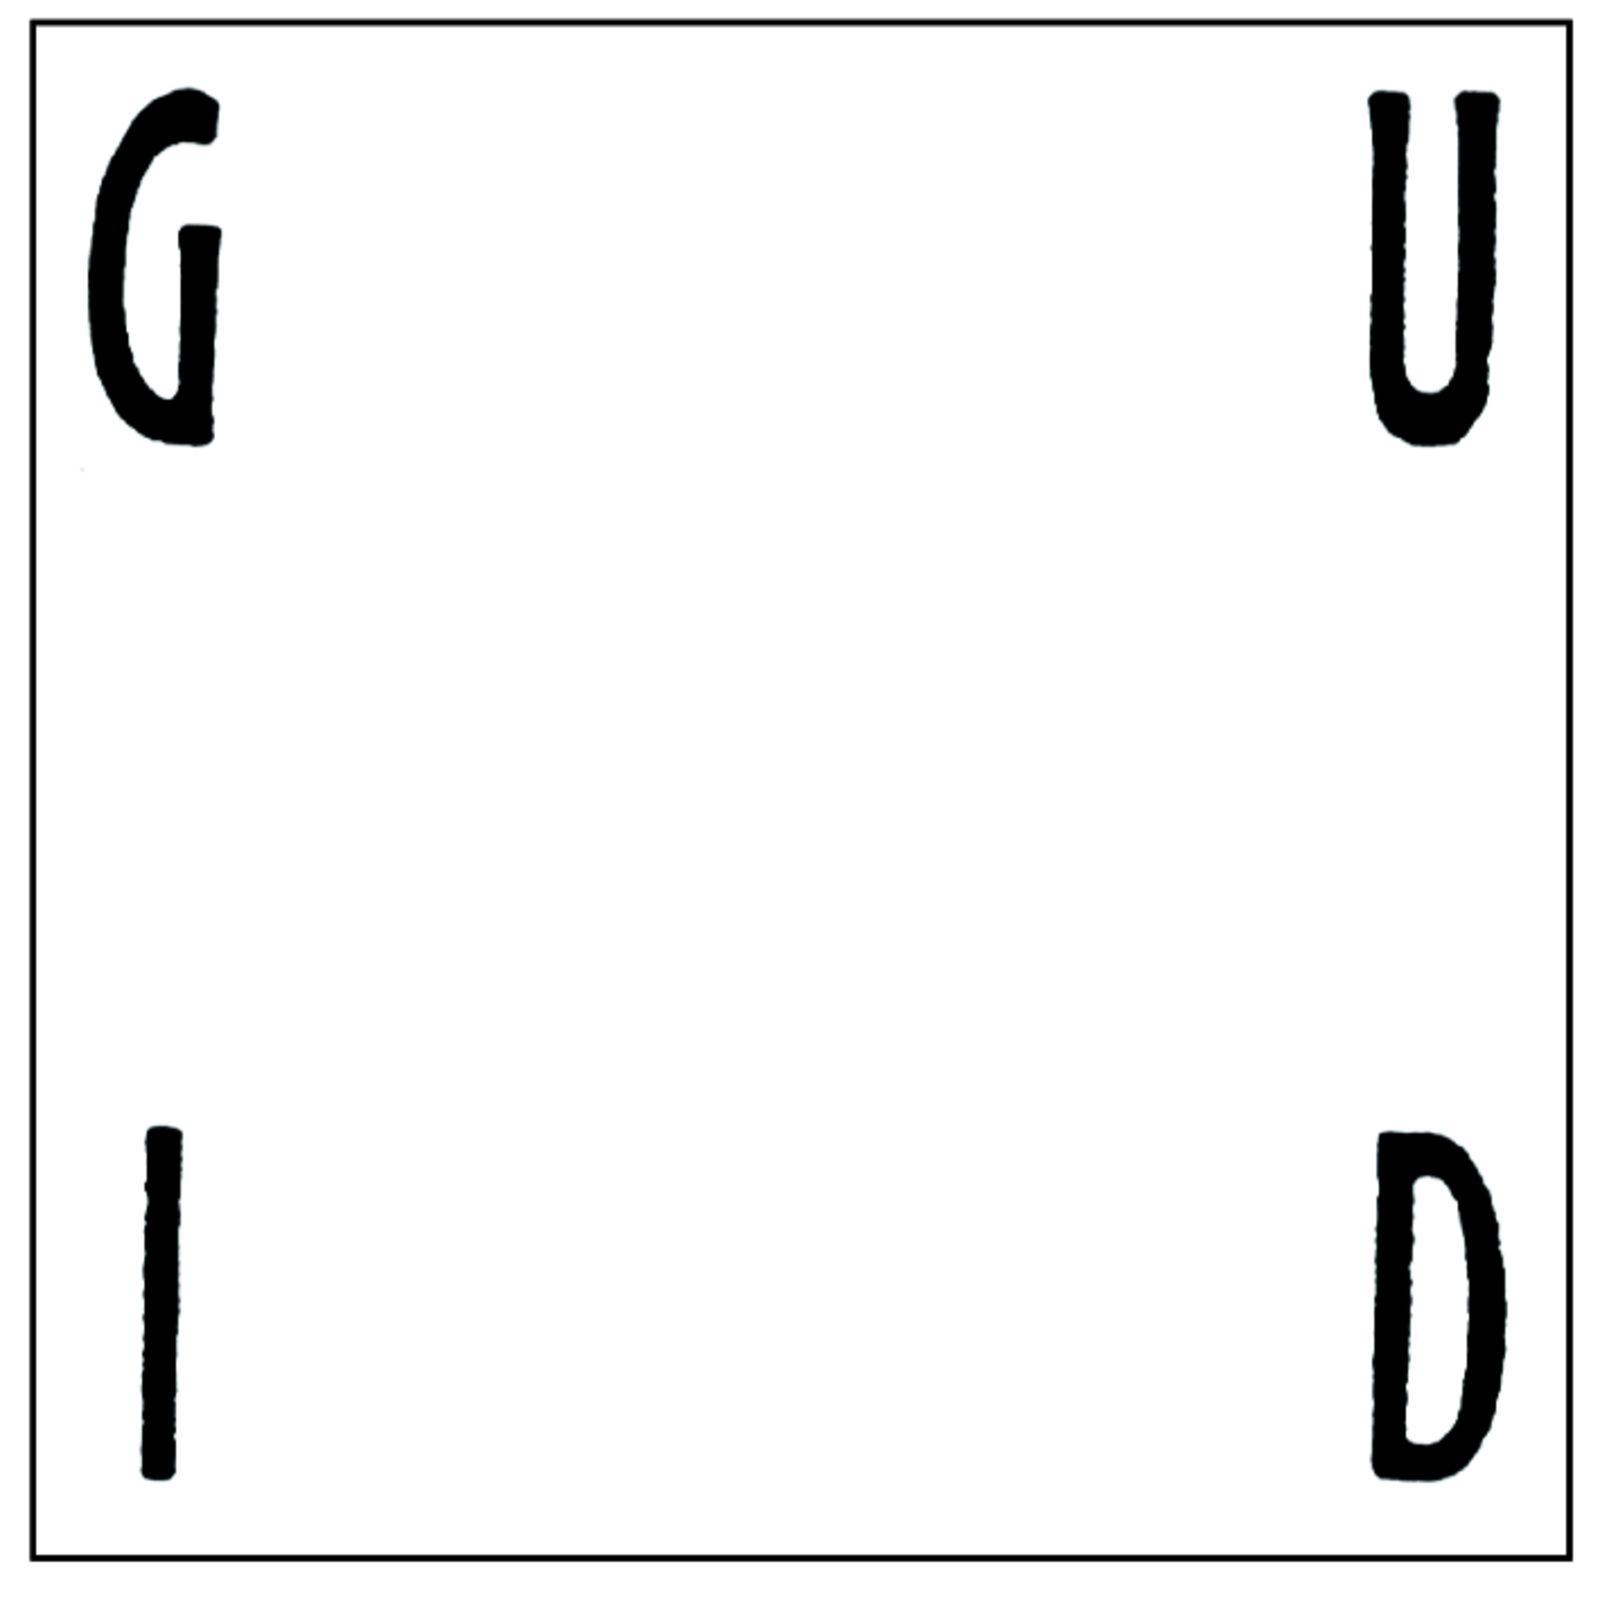 Guidi (Image 1)